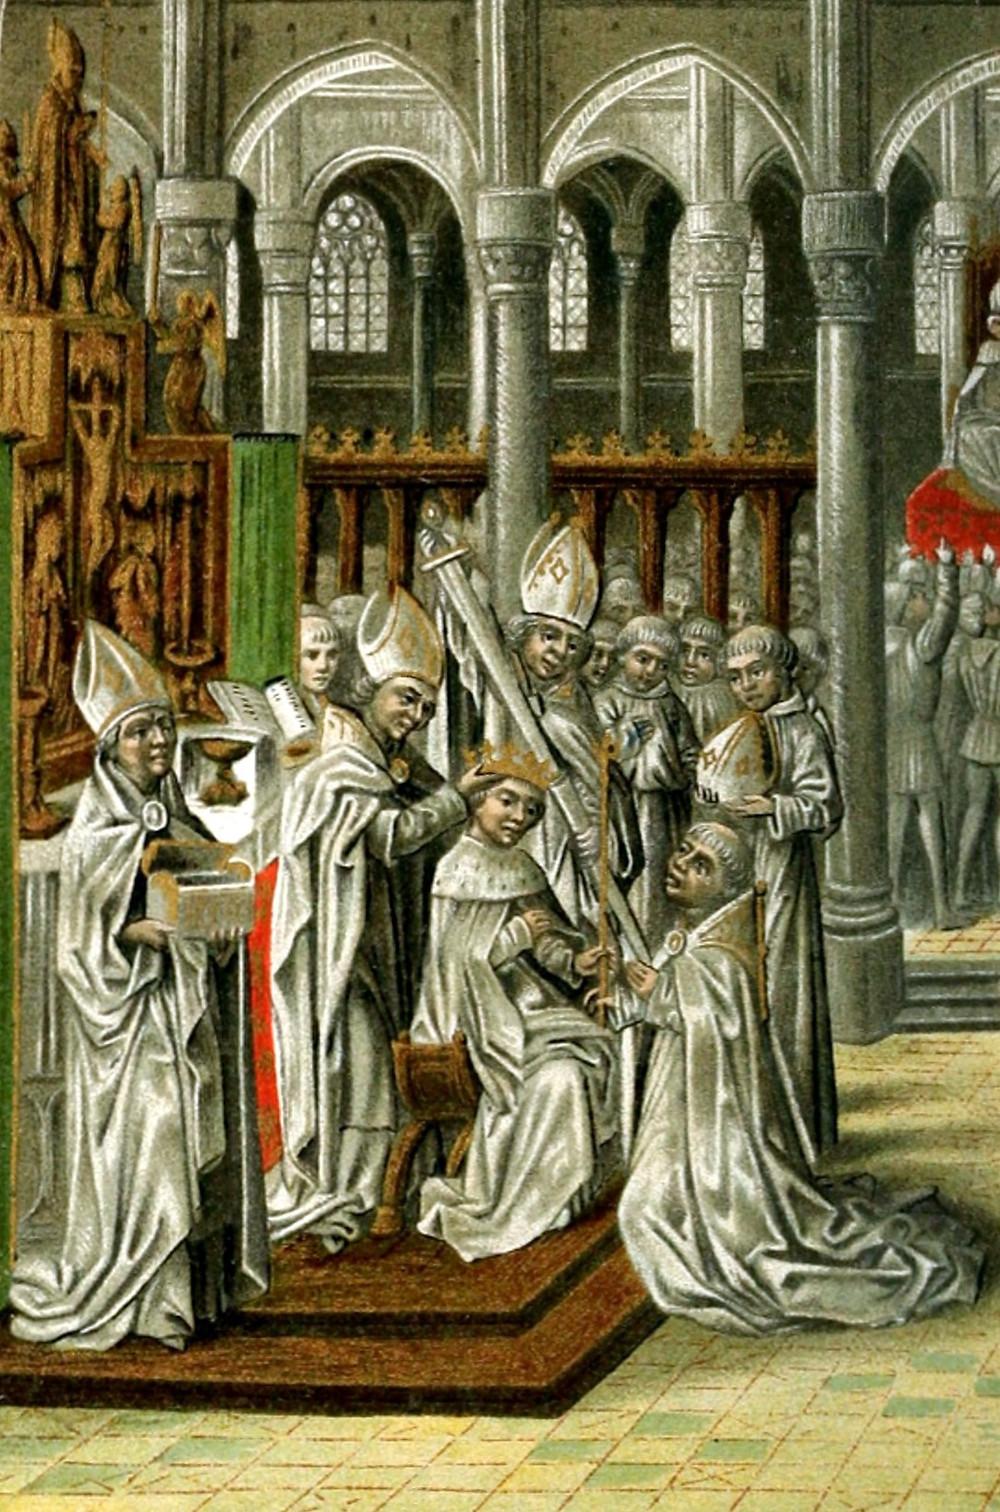 Henry IV coronation, 13 October 1399